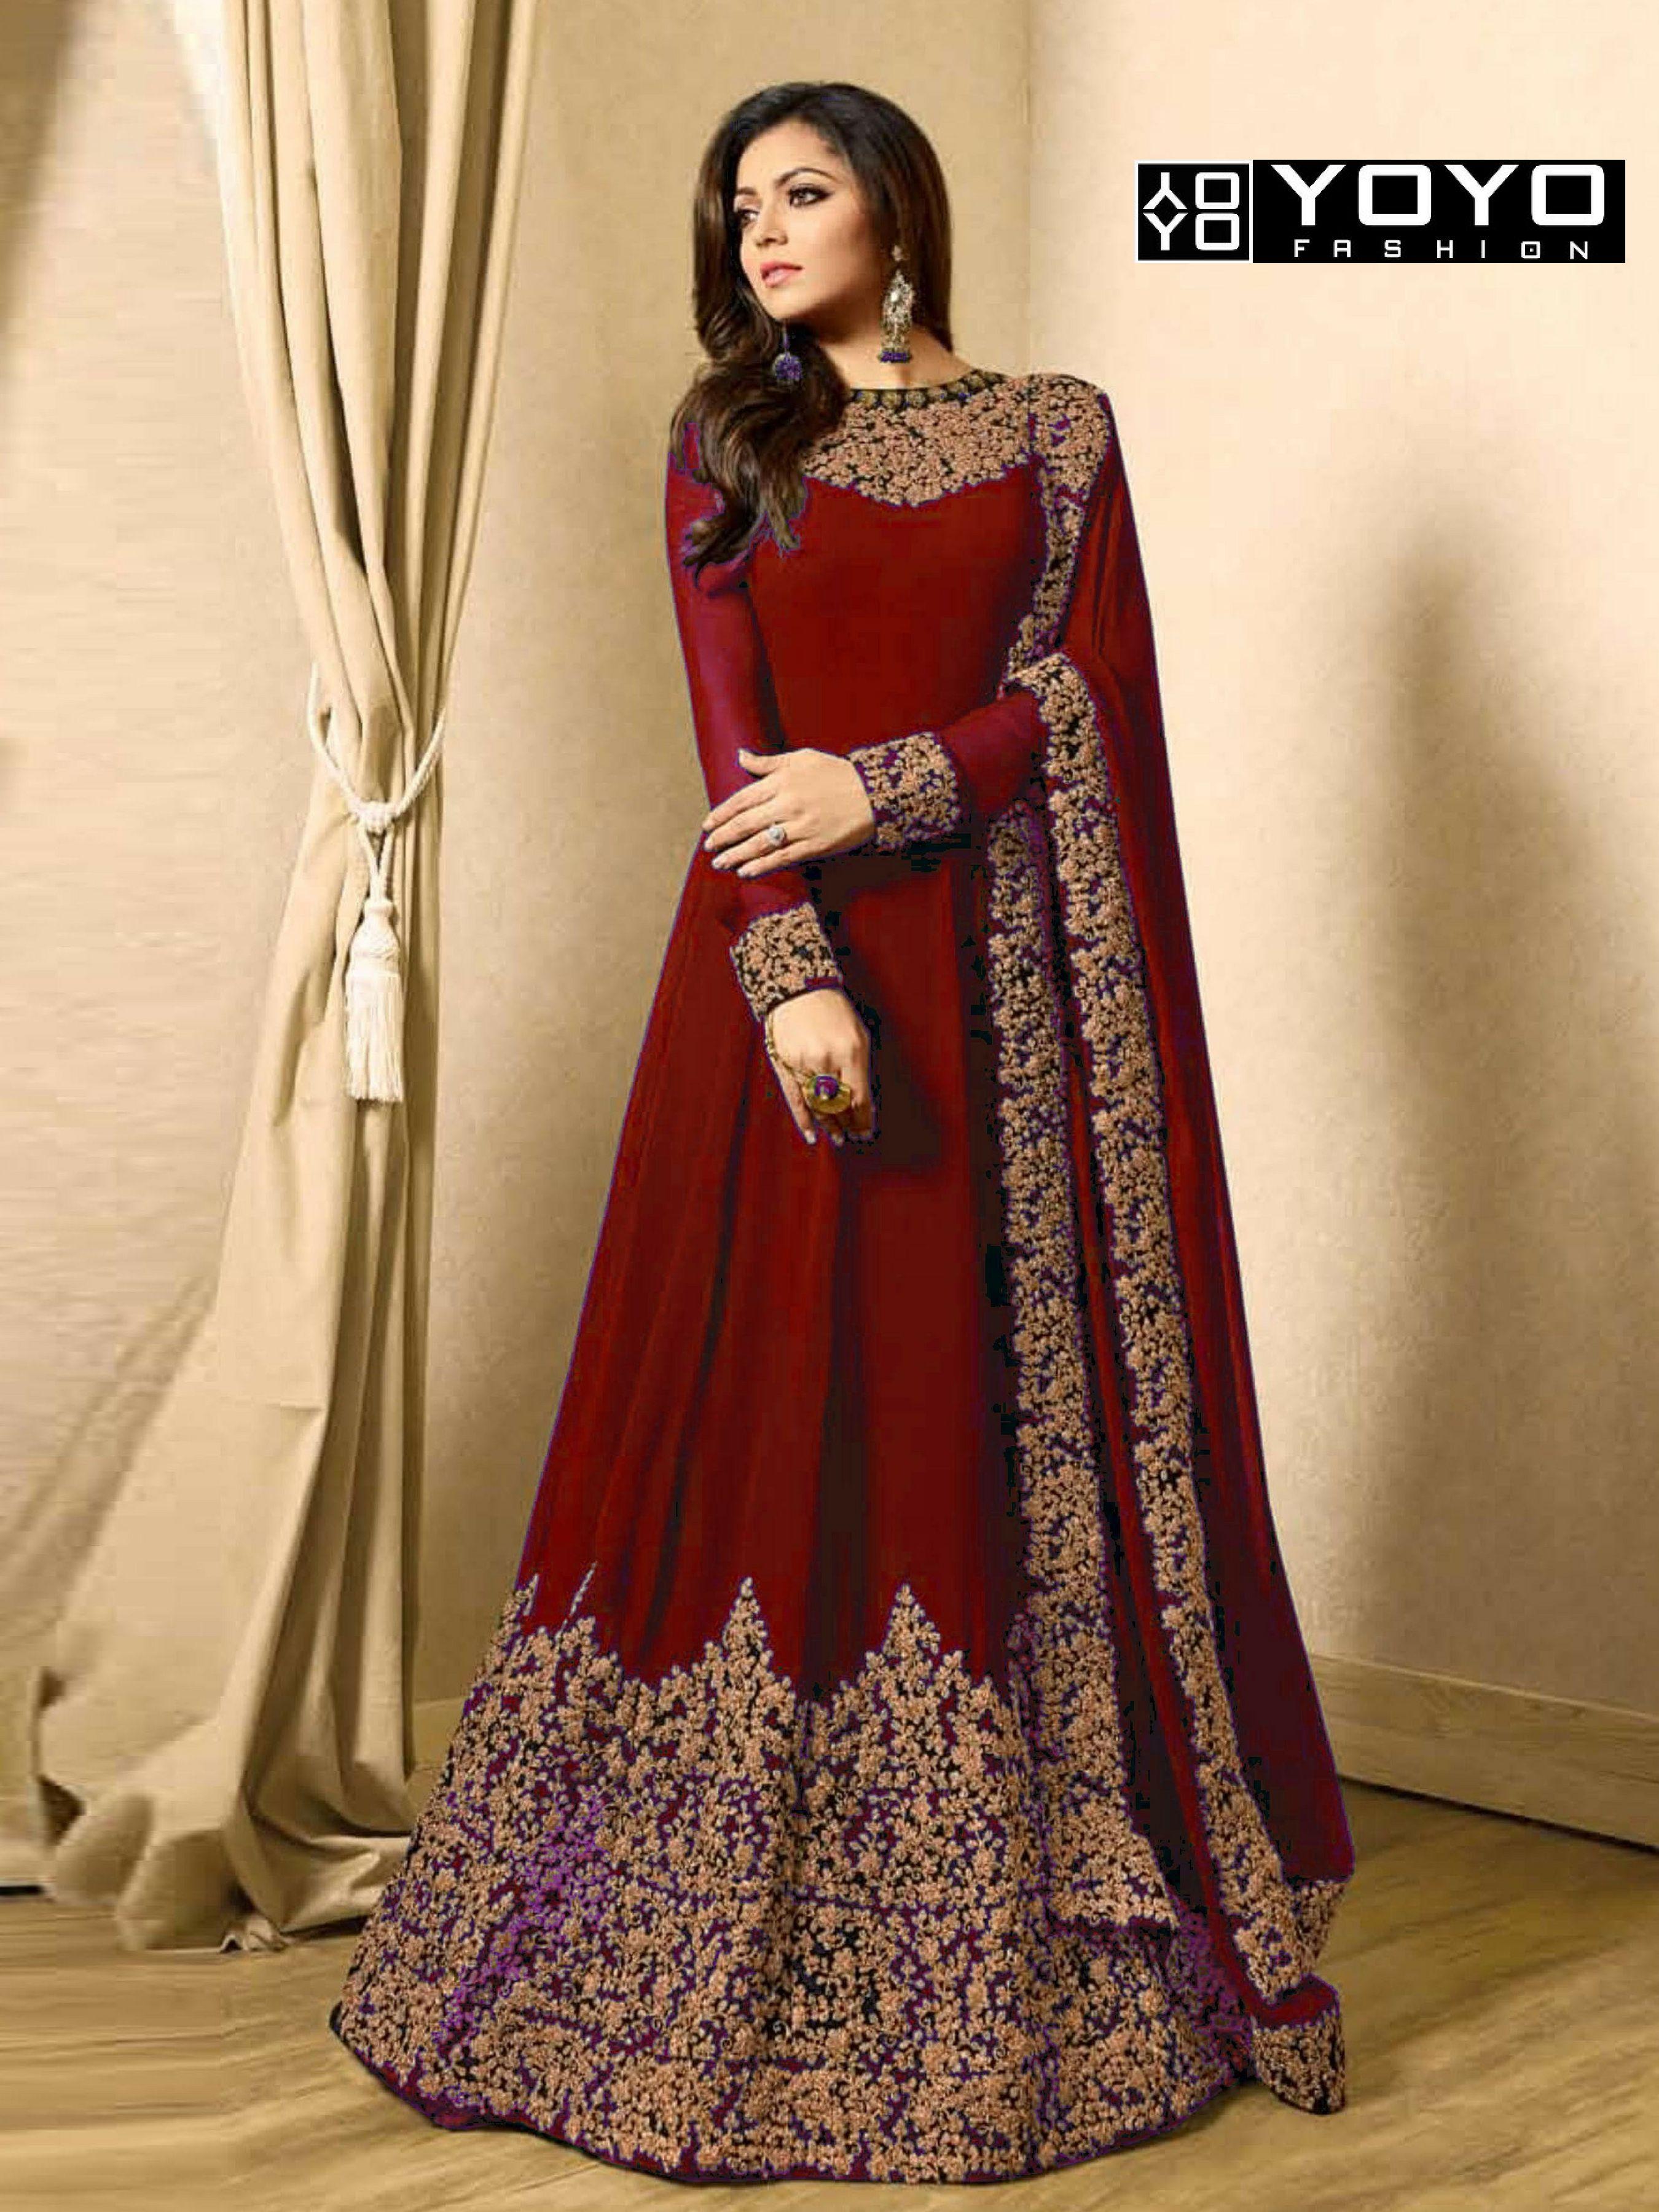 10eb32ad1bcb Exceptional attractive Anarkali salwar kameez for party wear and wedding  wear at  YOYOFashion.Newly